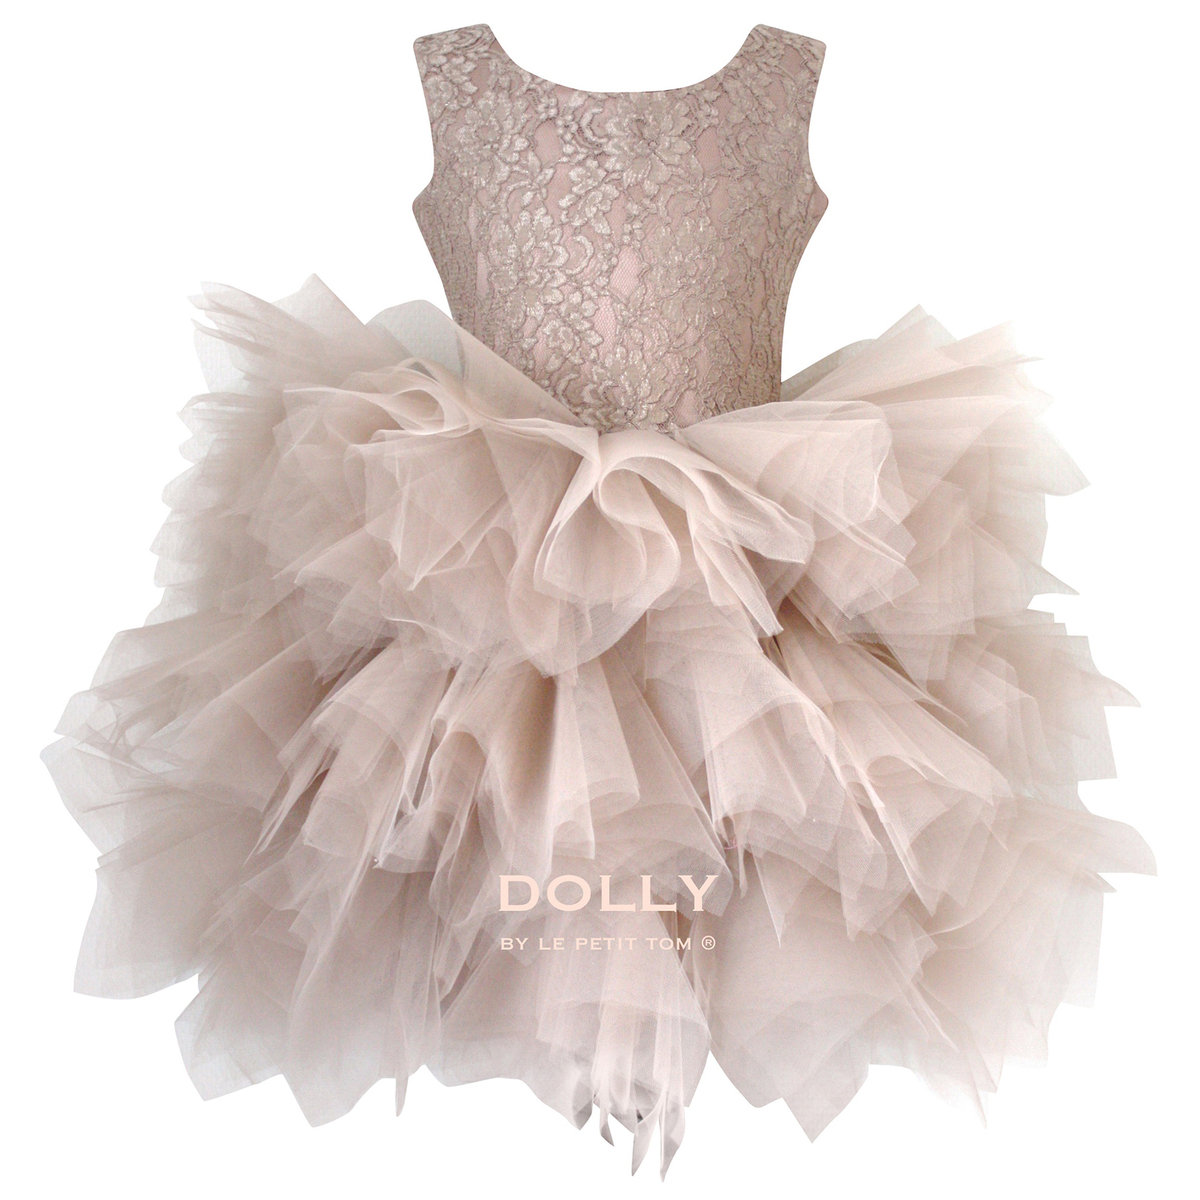 abb8cd617de7 Ballerina Style Taupe Tutu Dress Thumbnail